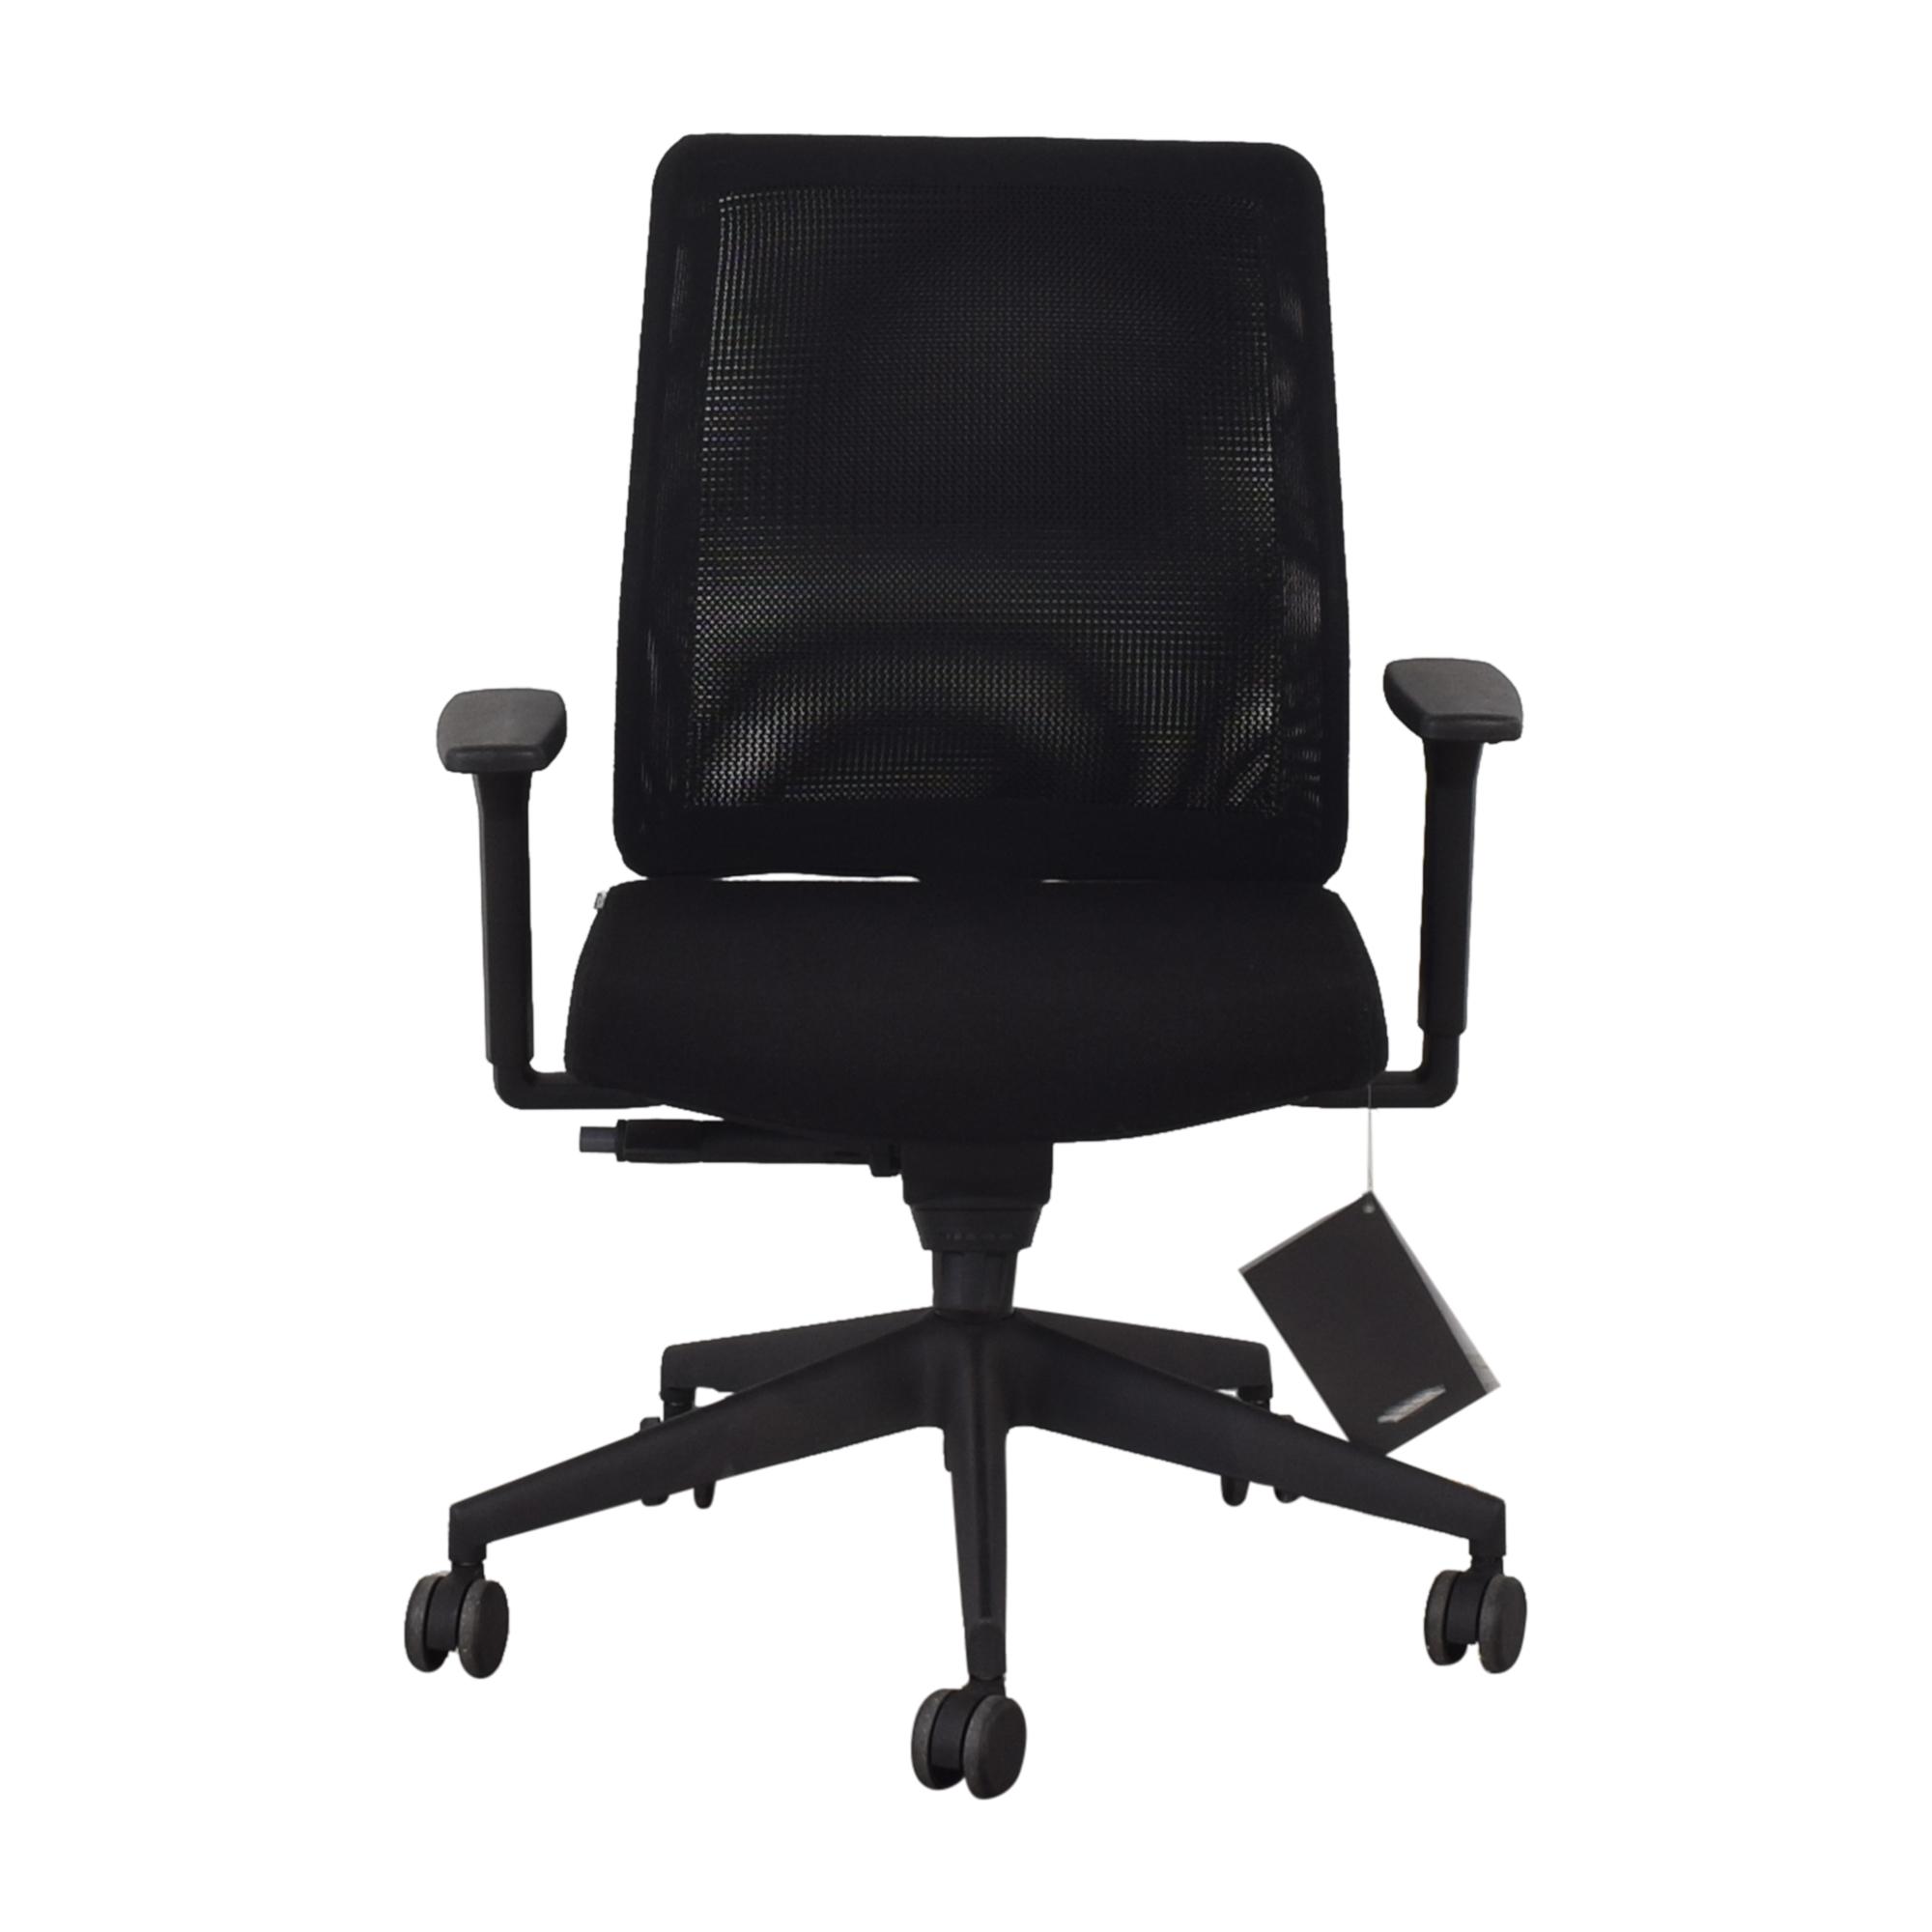 Koleksiyon Koleksiyon Dastan Operational Chair ct